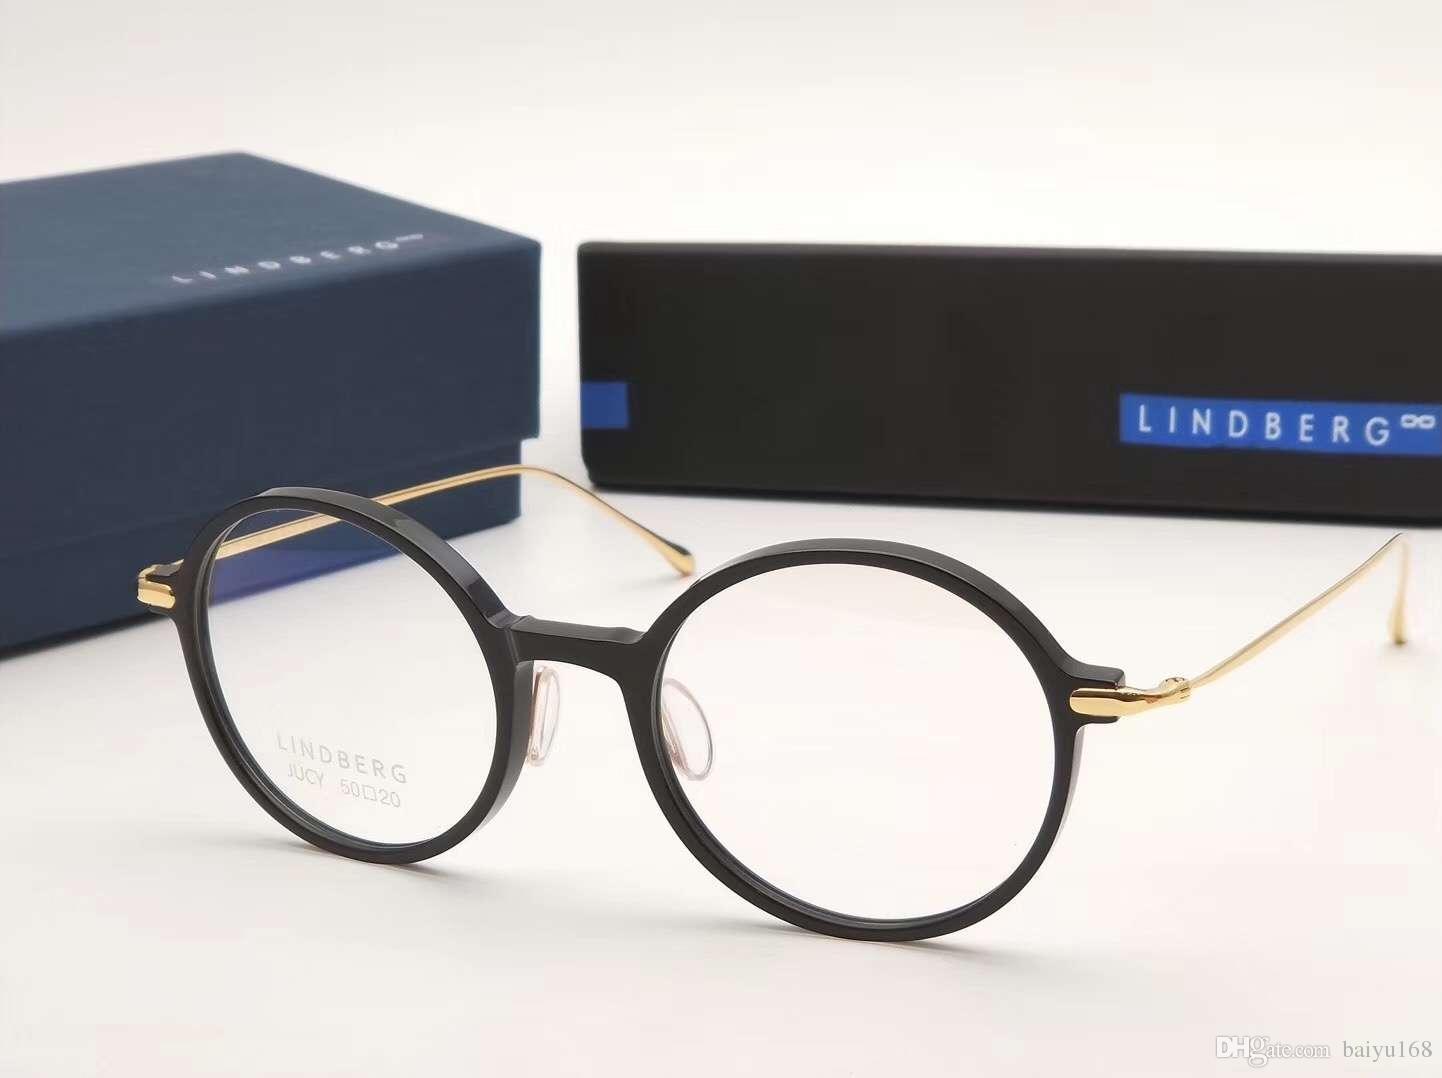 d19e4f917b1 Lindberg jucy round titanium eyeglasses eyewear black frame luxury sunglasses  brand new with case from baiyu